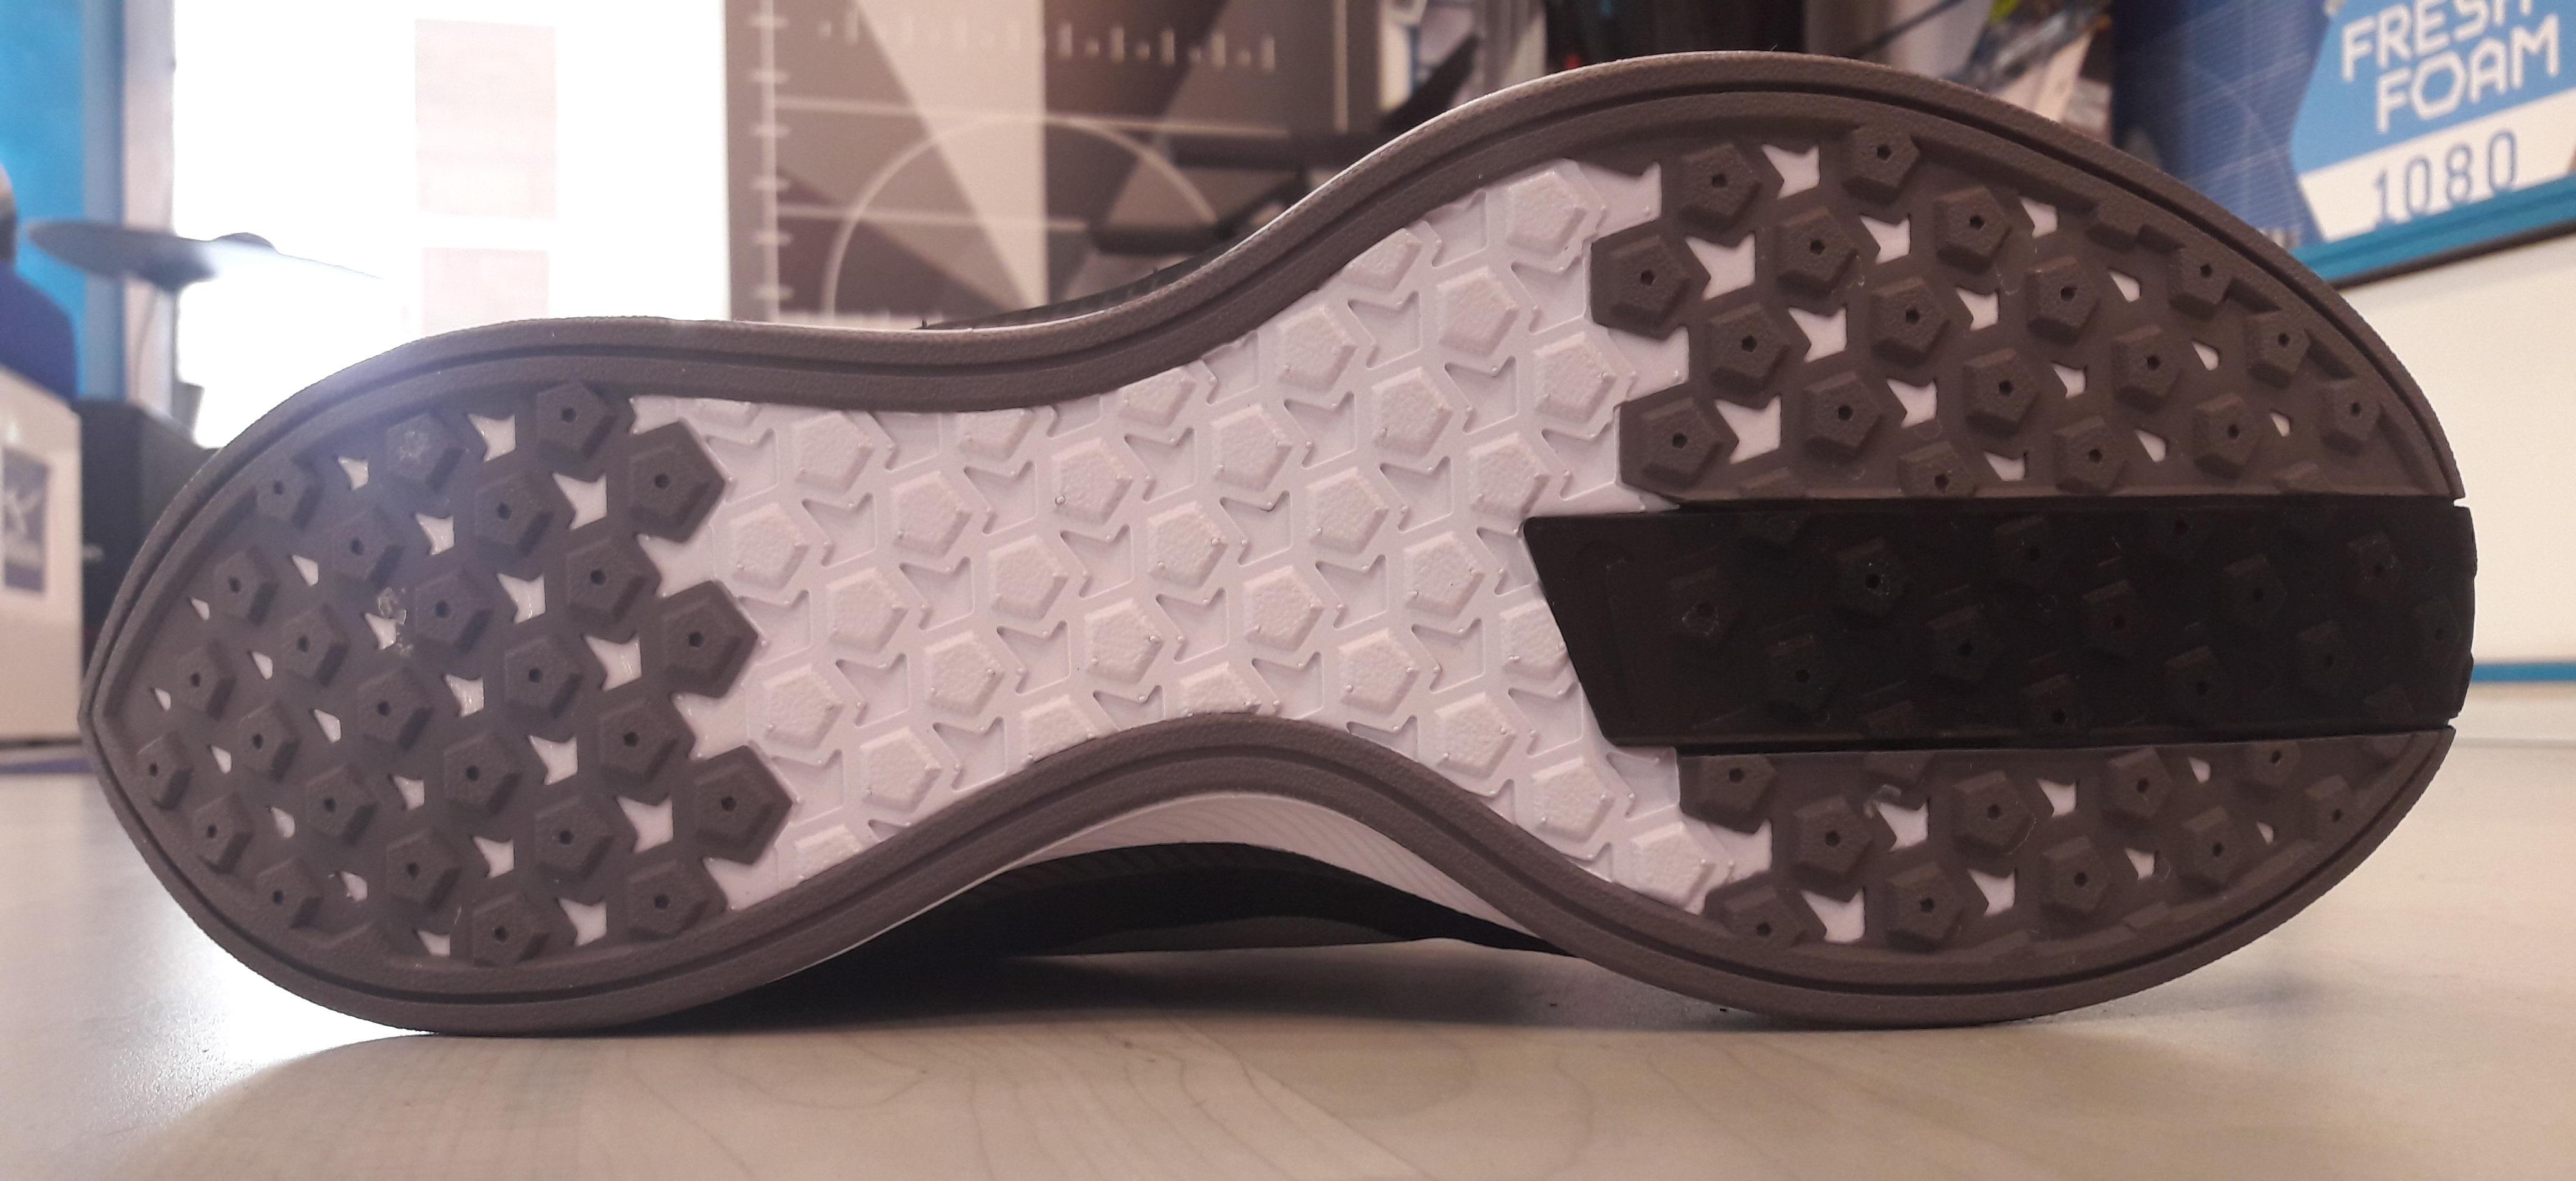 Nike suela